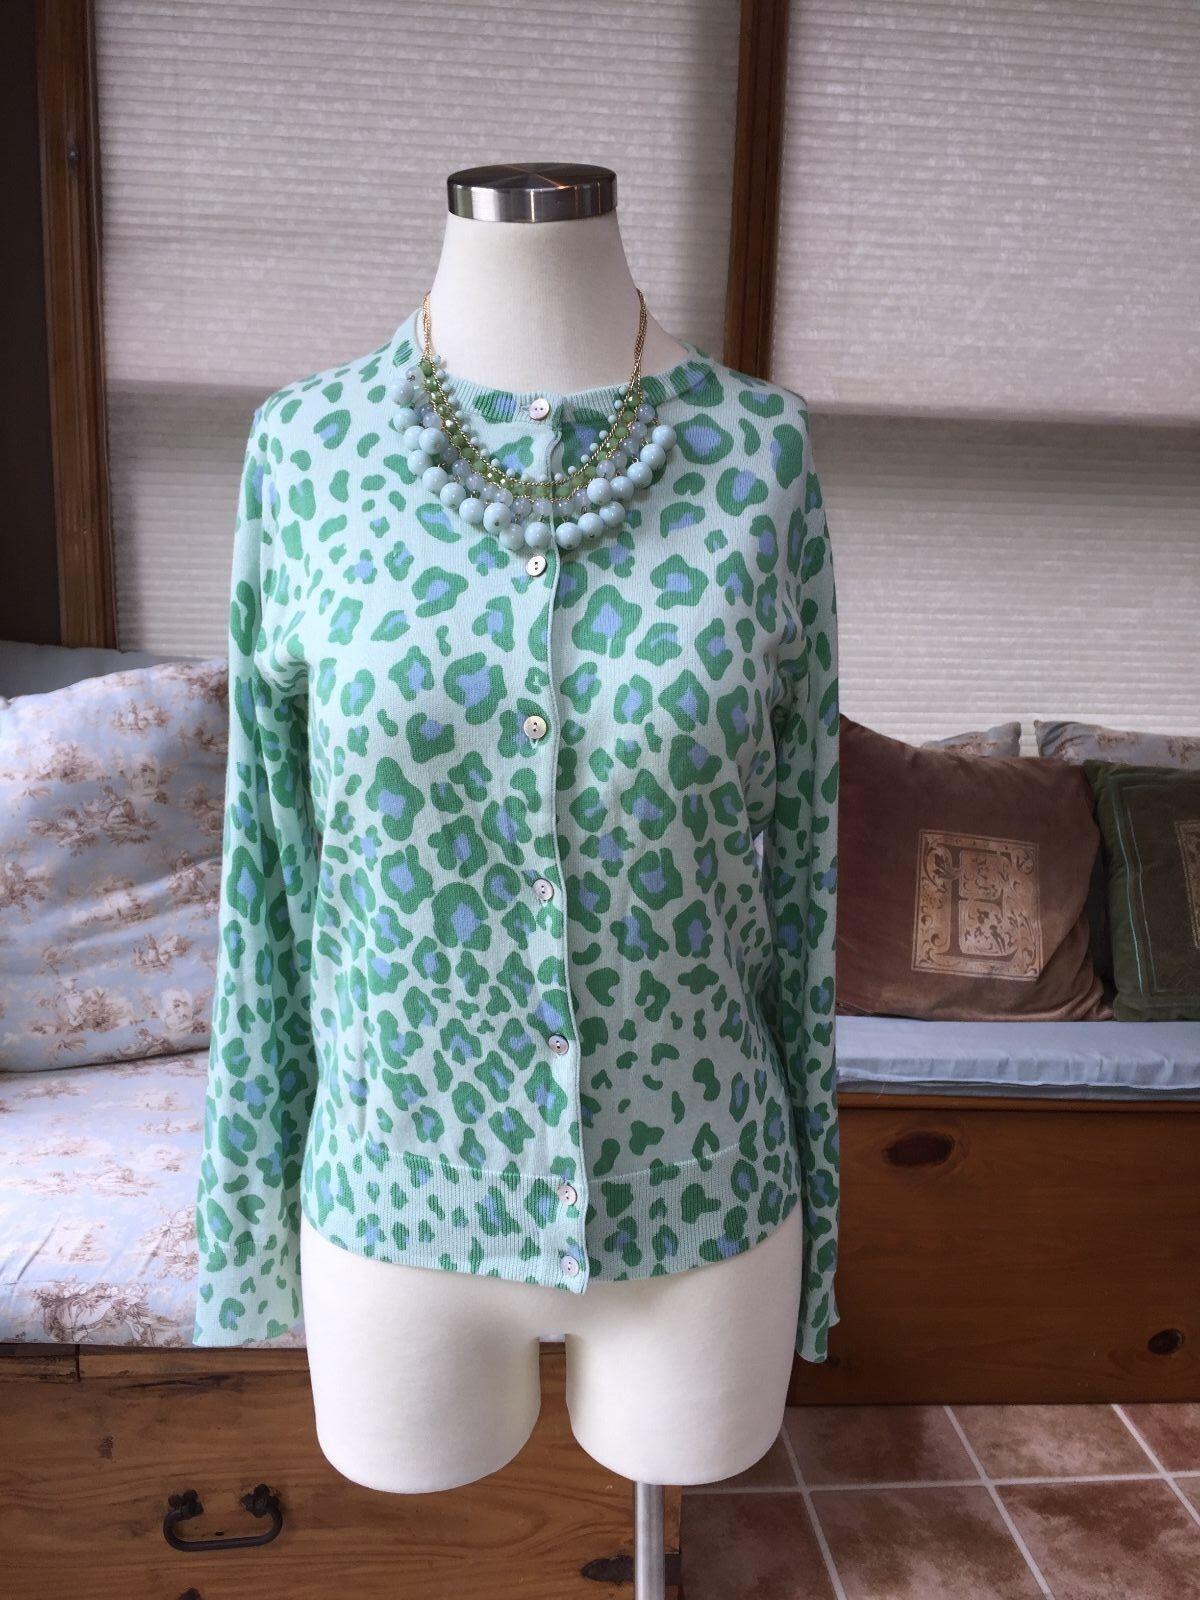 Lands' End Supima Cotton Green bluee Leopard Cheetah Cardigan Sweater Small EUC